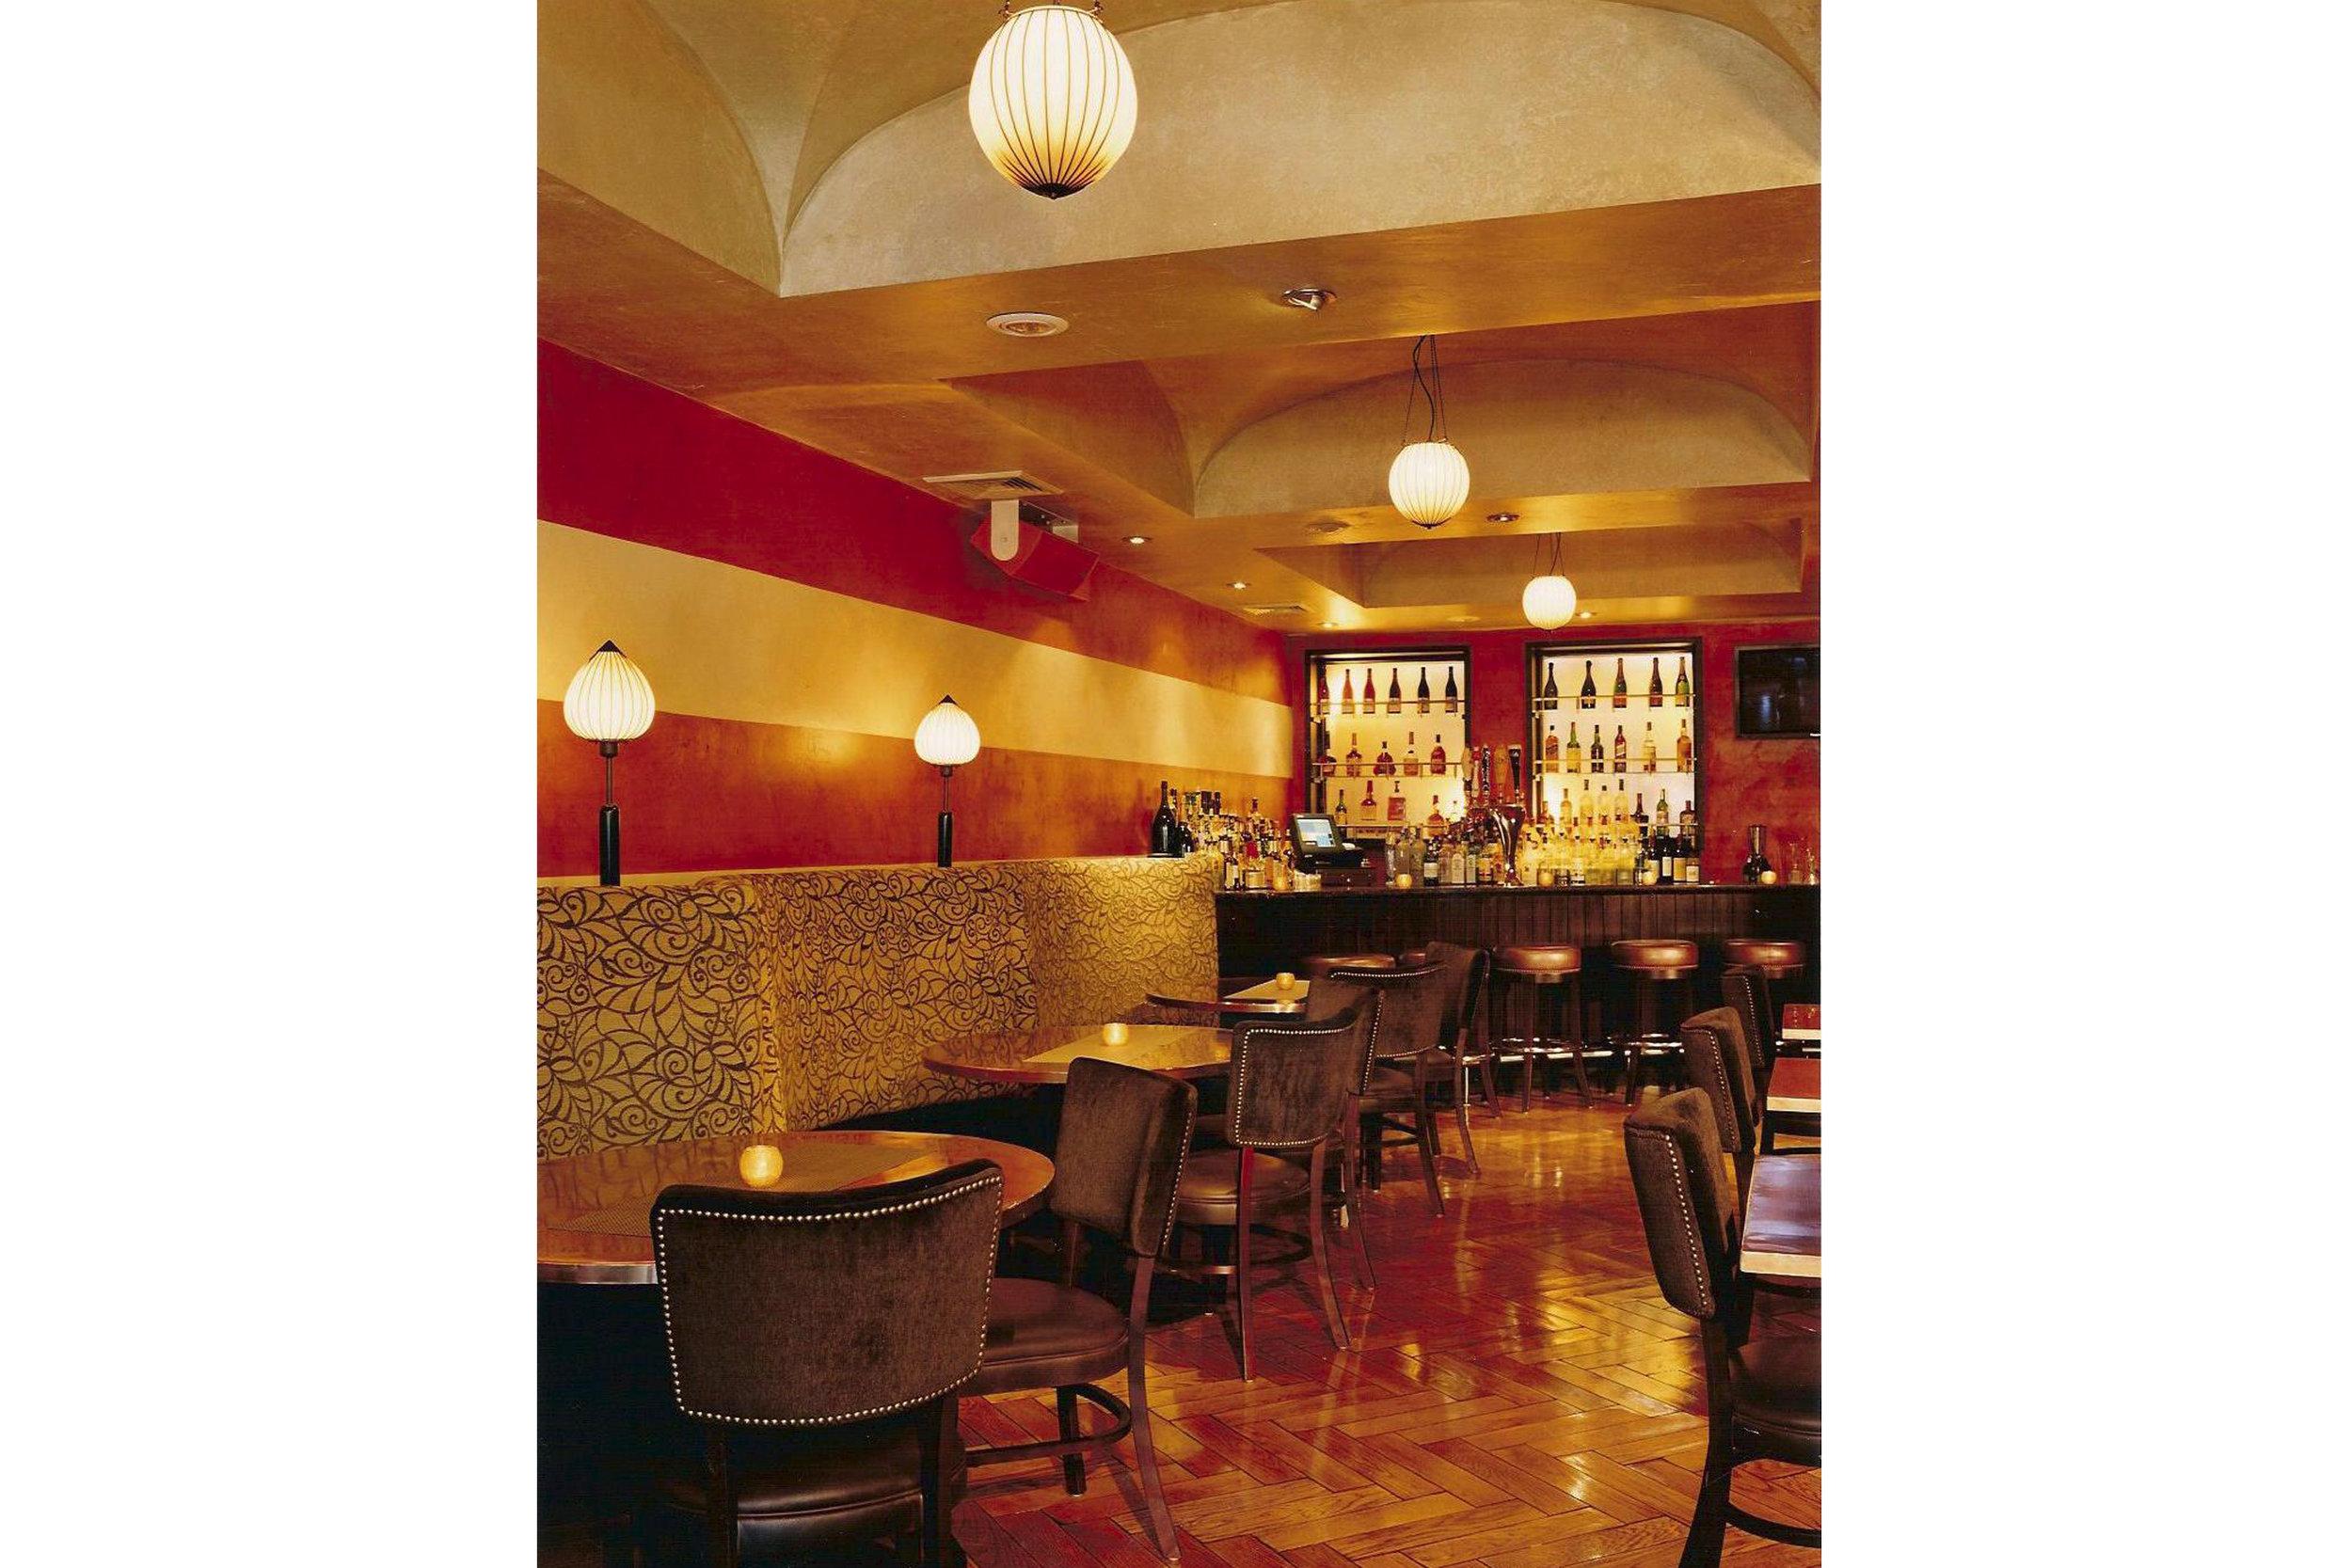 Banc Cafe - New York, NY